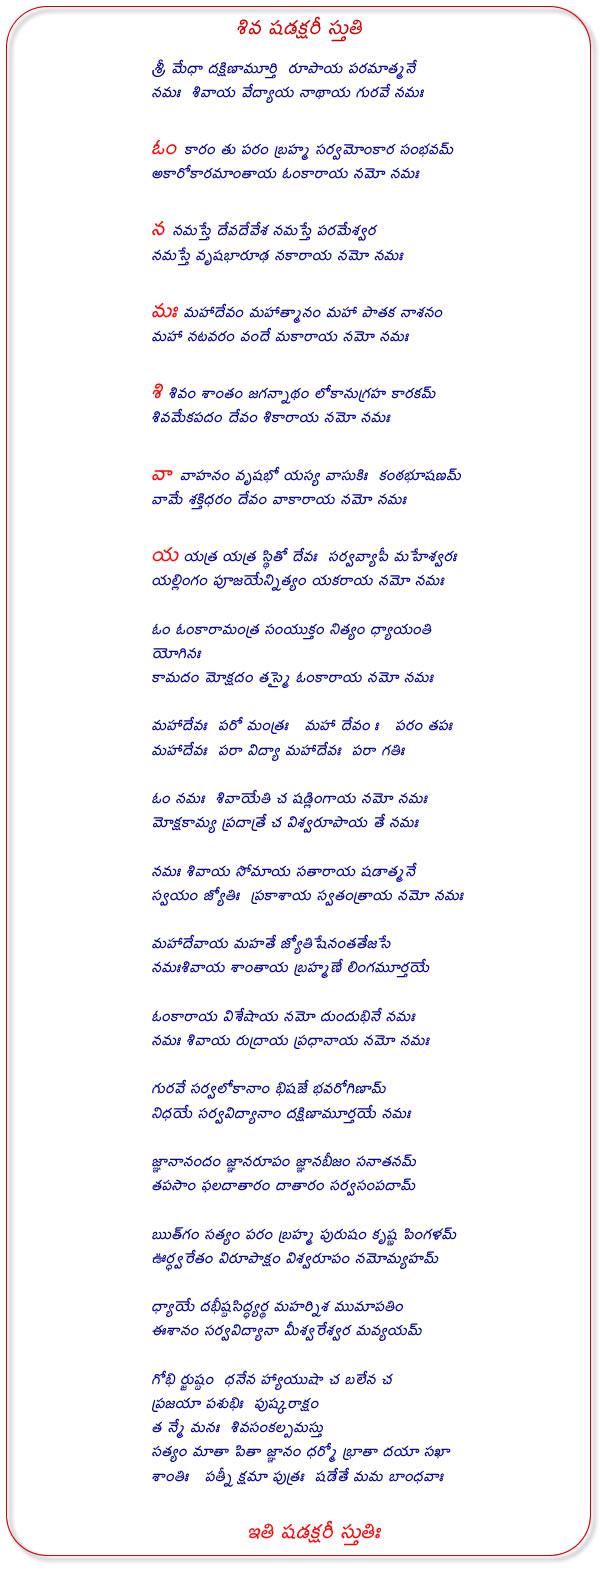 Rudraashtakam (Shiva Stuti)